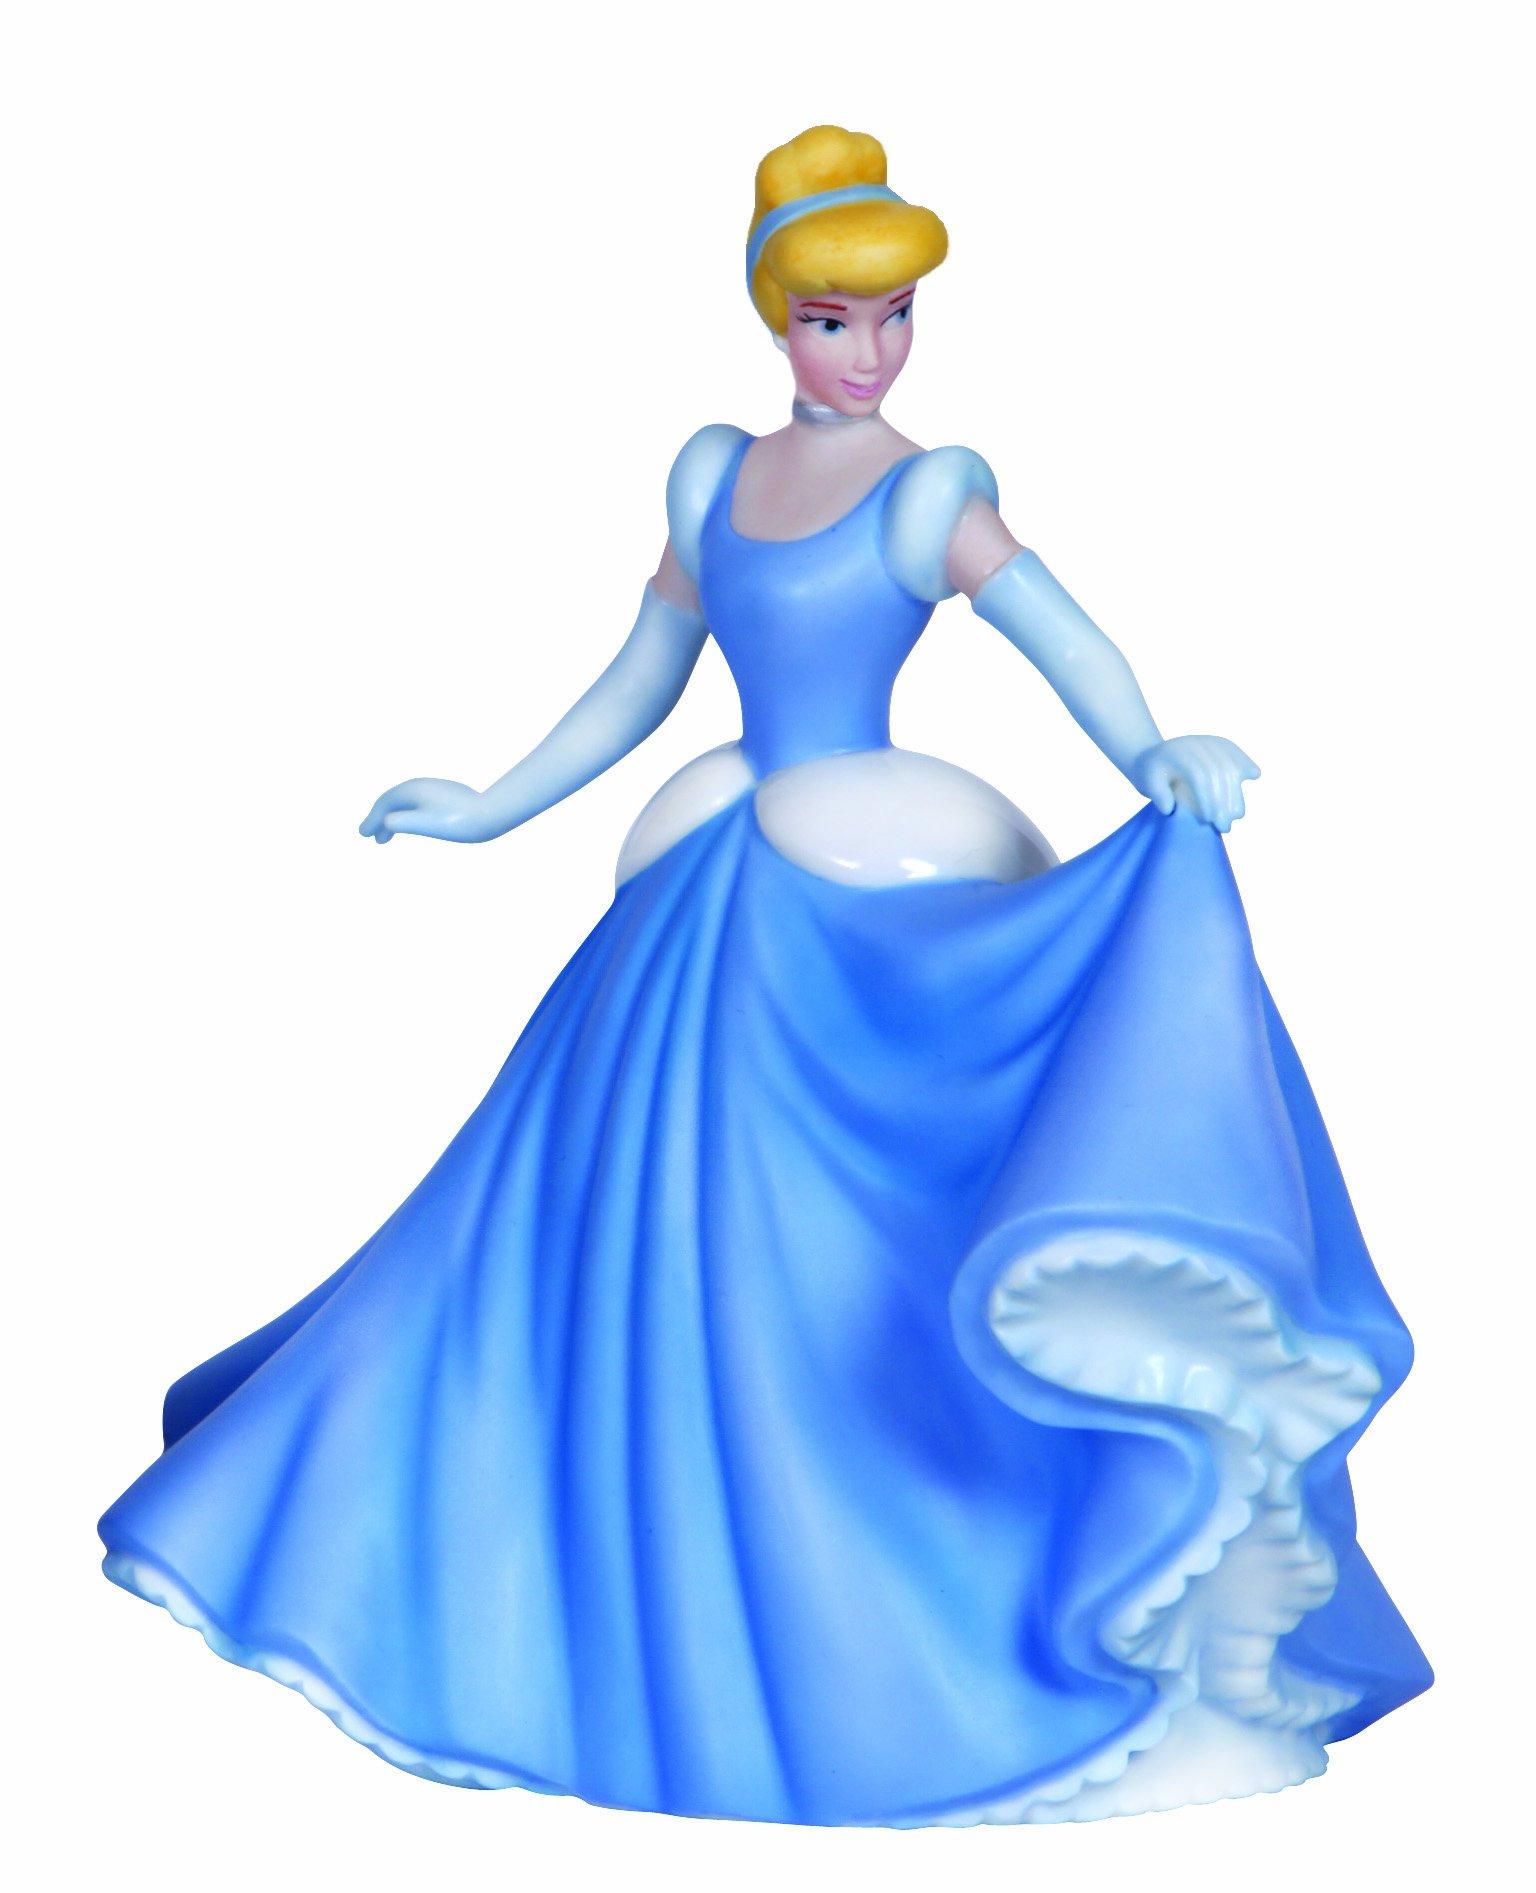 Precious Moments, Disney Showcase Collection, Let Your Heart Dance, Bisque Porcelain Figurine, 132707